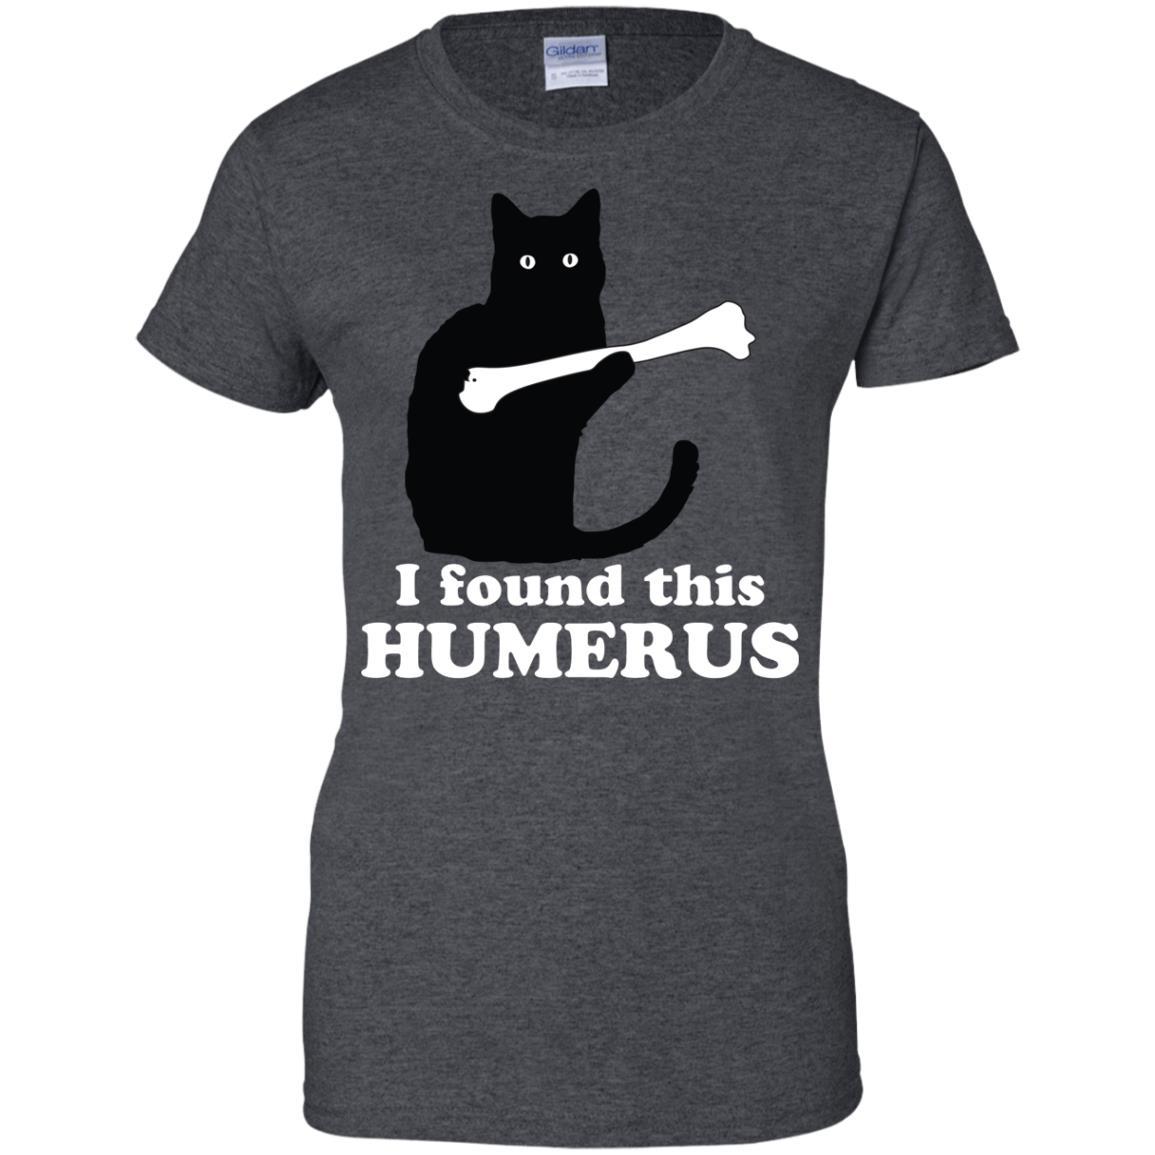 972e8ec70 Cat Black I Found This Humerus shirt - image 2408 510x510